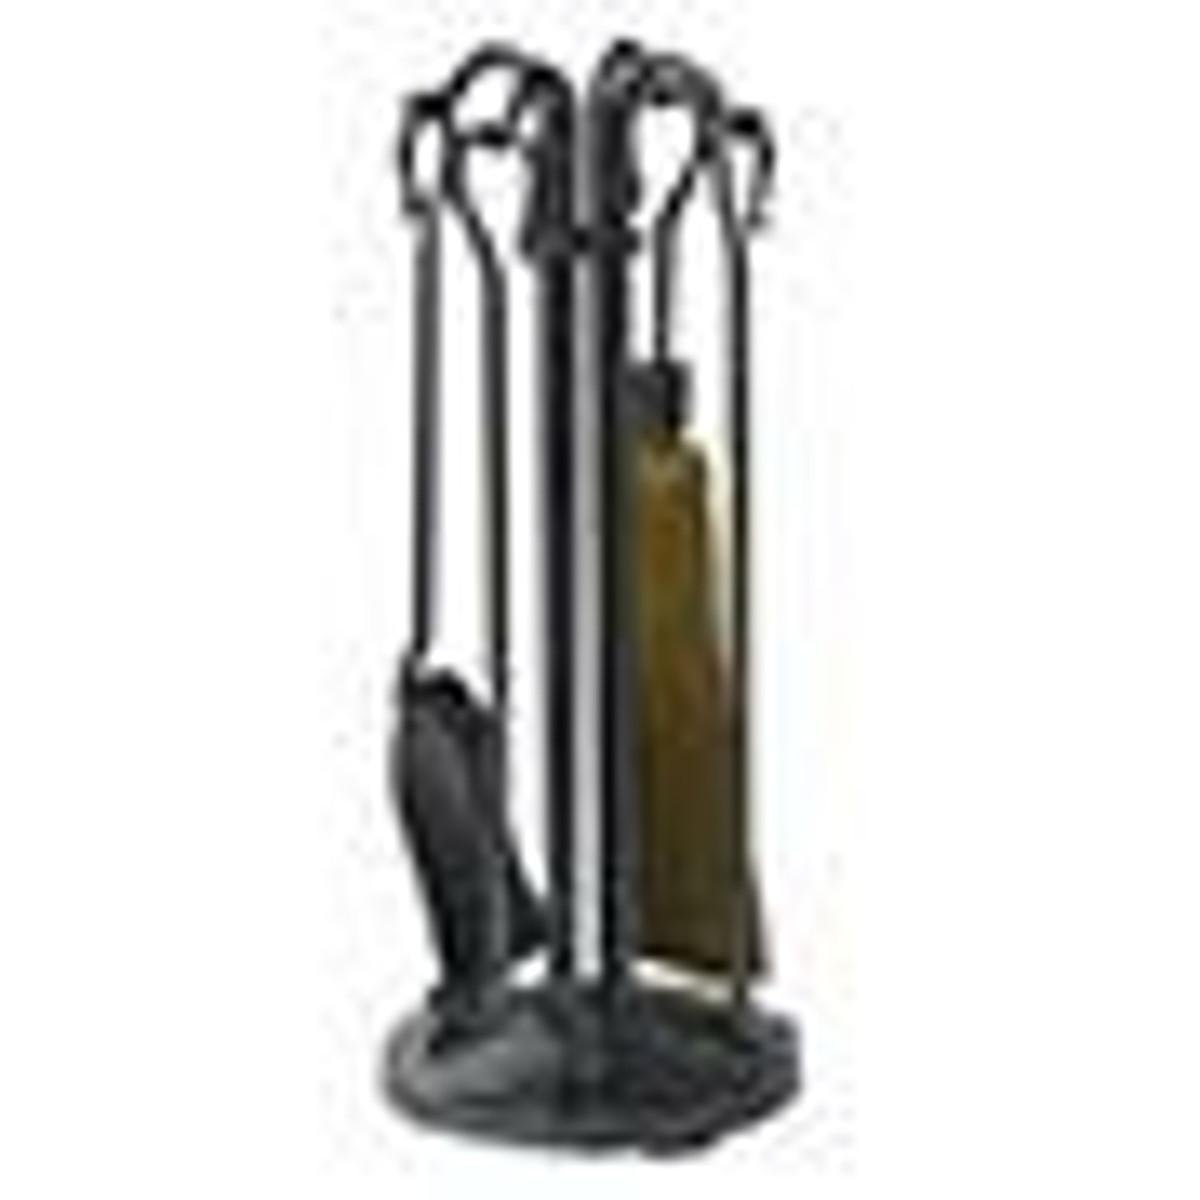 Black Fireplace Tool Sets